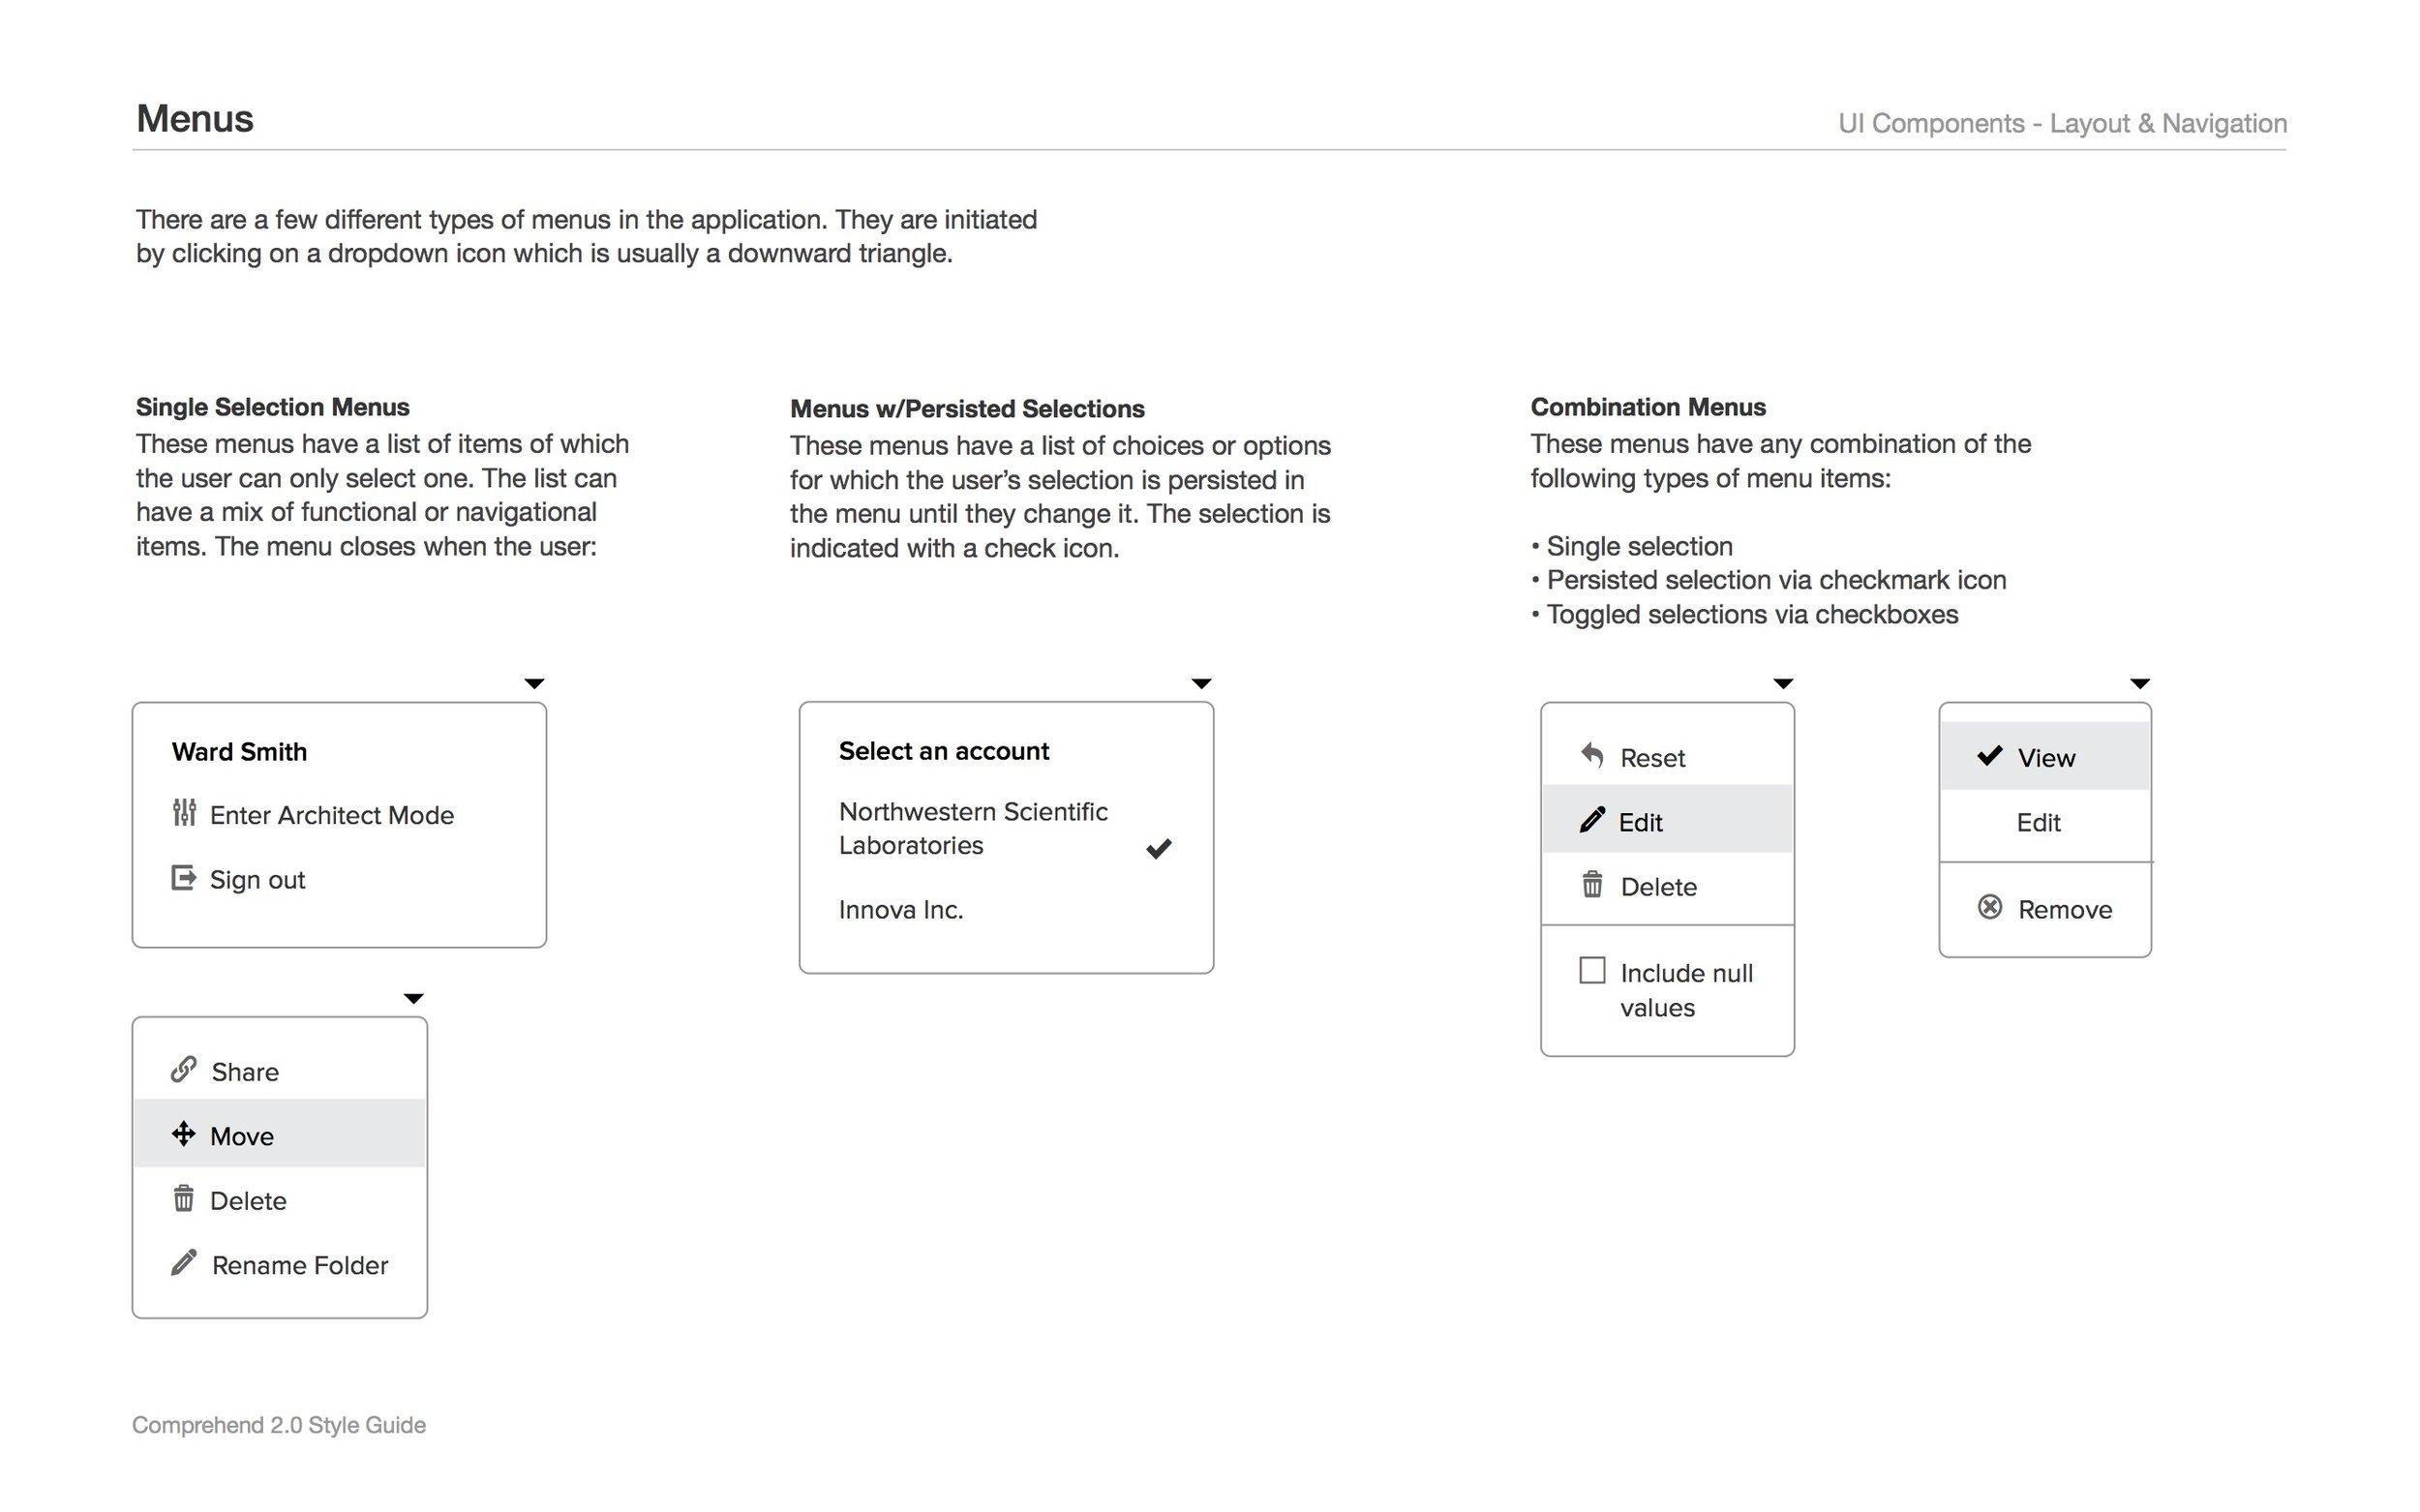 StyleGuide_Comprehend_2.0_menu.jpg